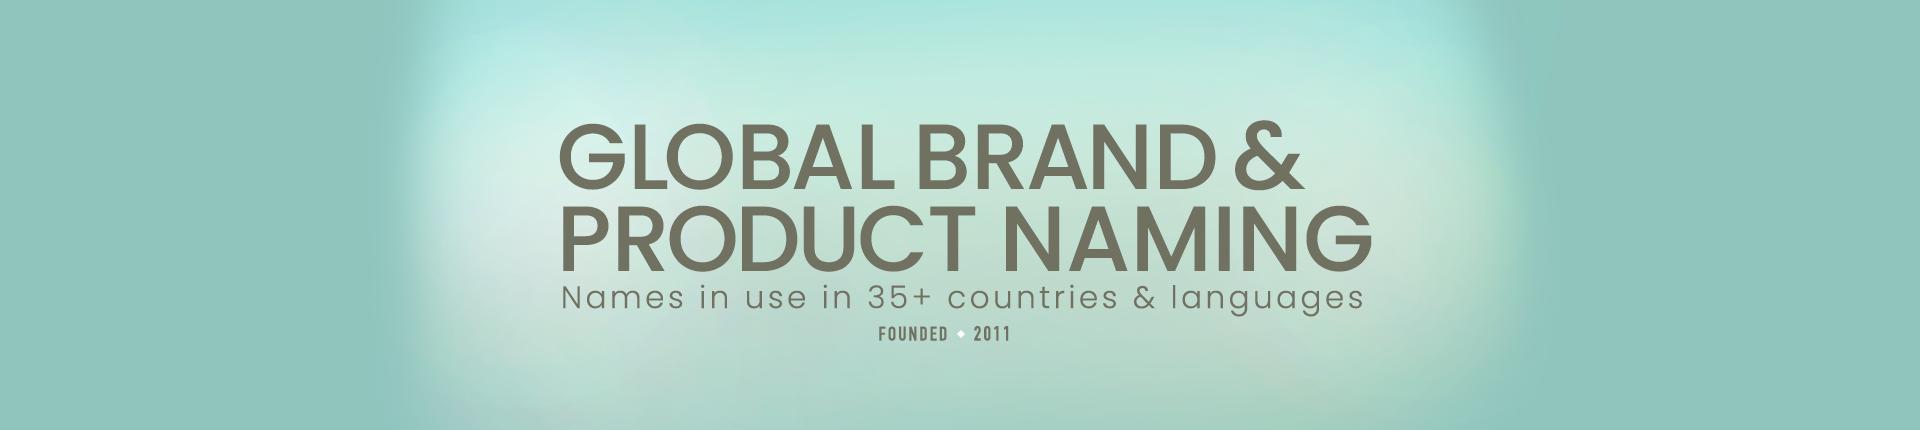 Global Brand Naming, Company & Product Naming